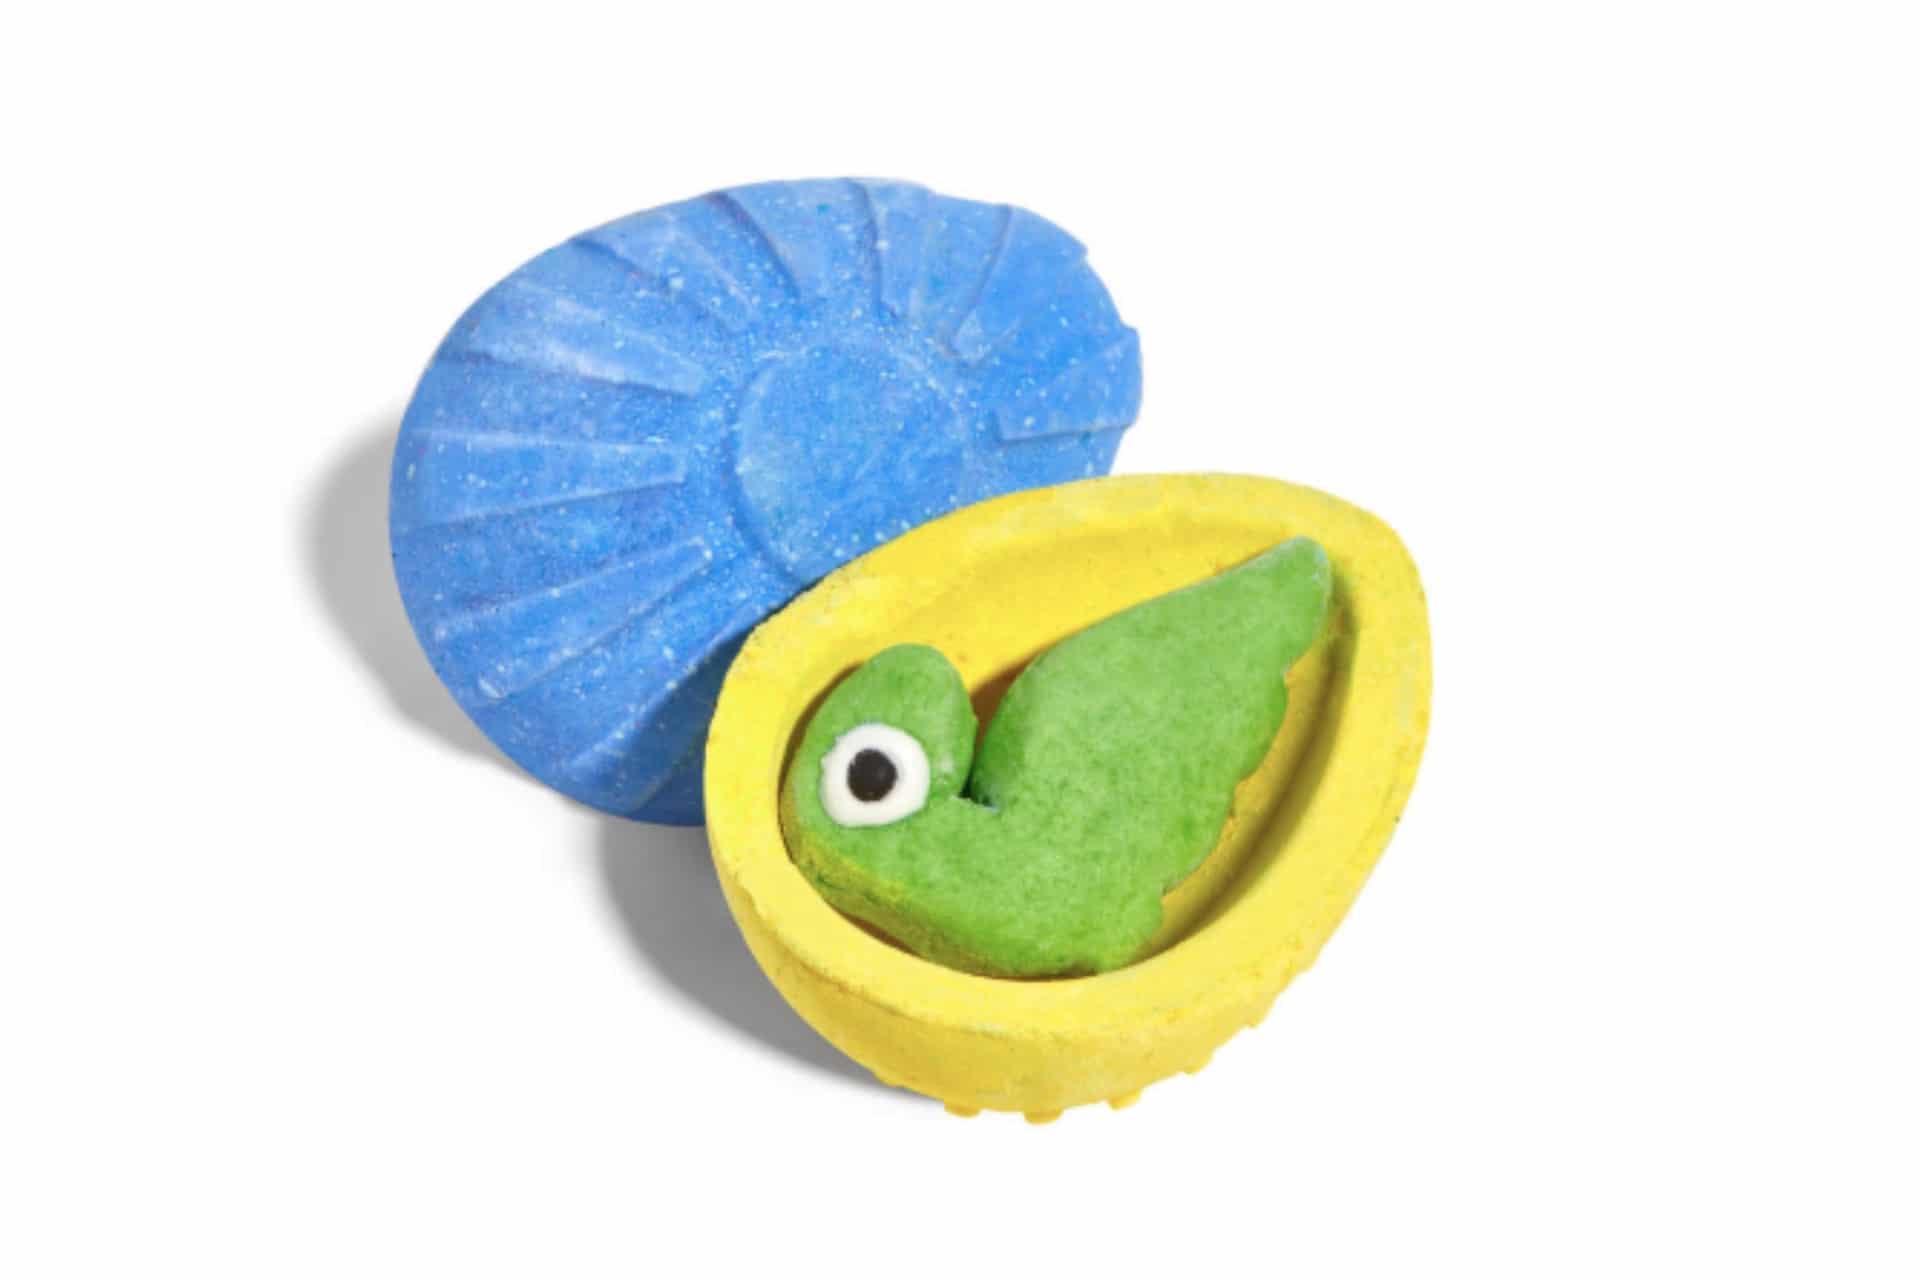 dino egg-shaped bath bomb